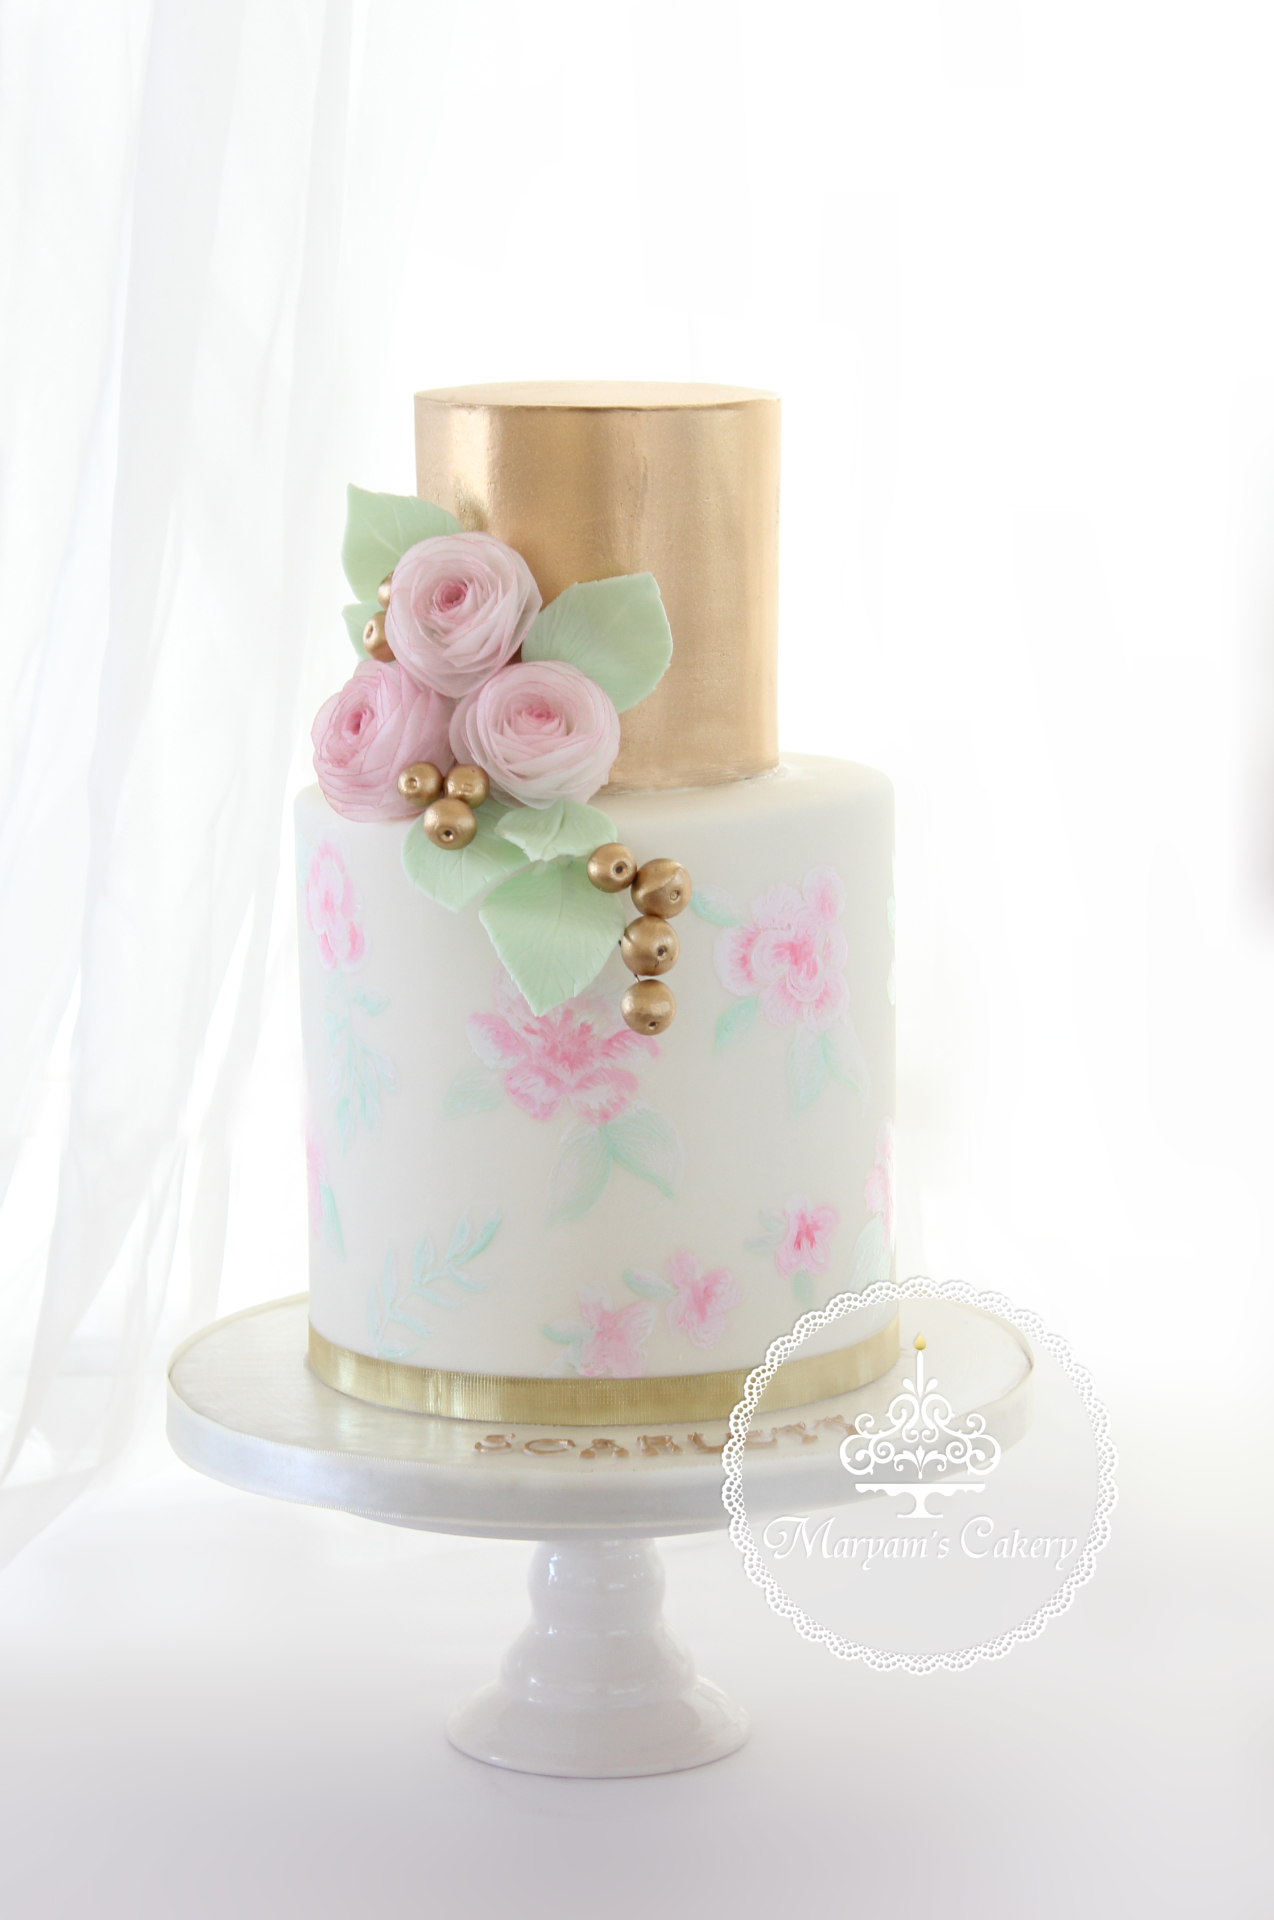 Soft gold & pink cake & desserts